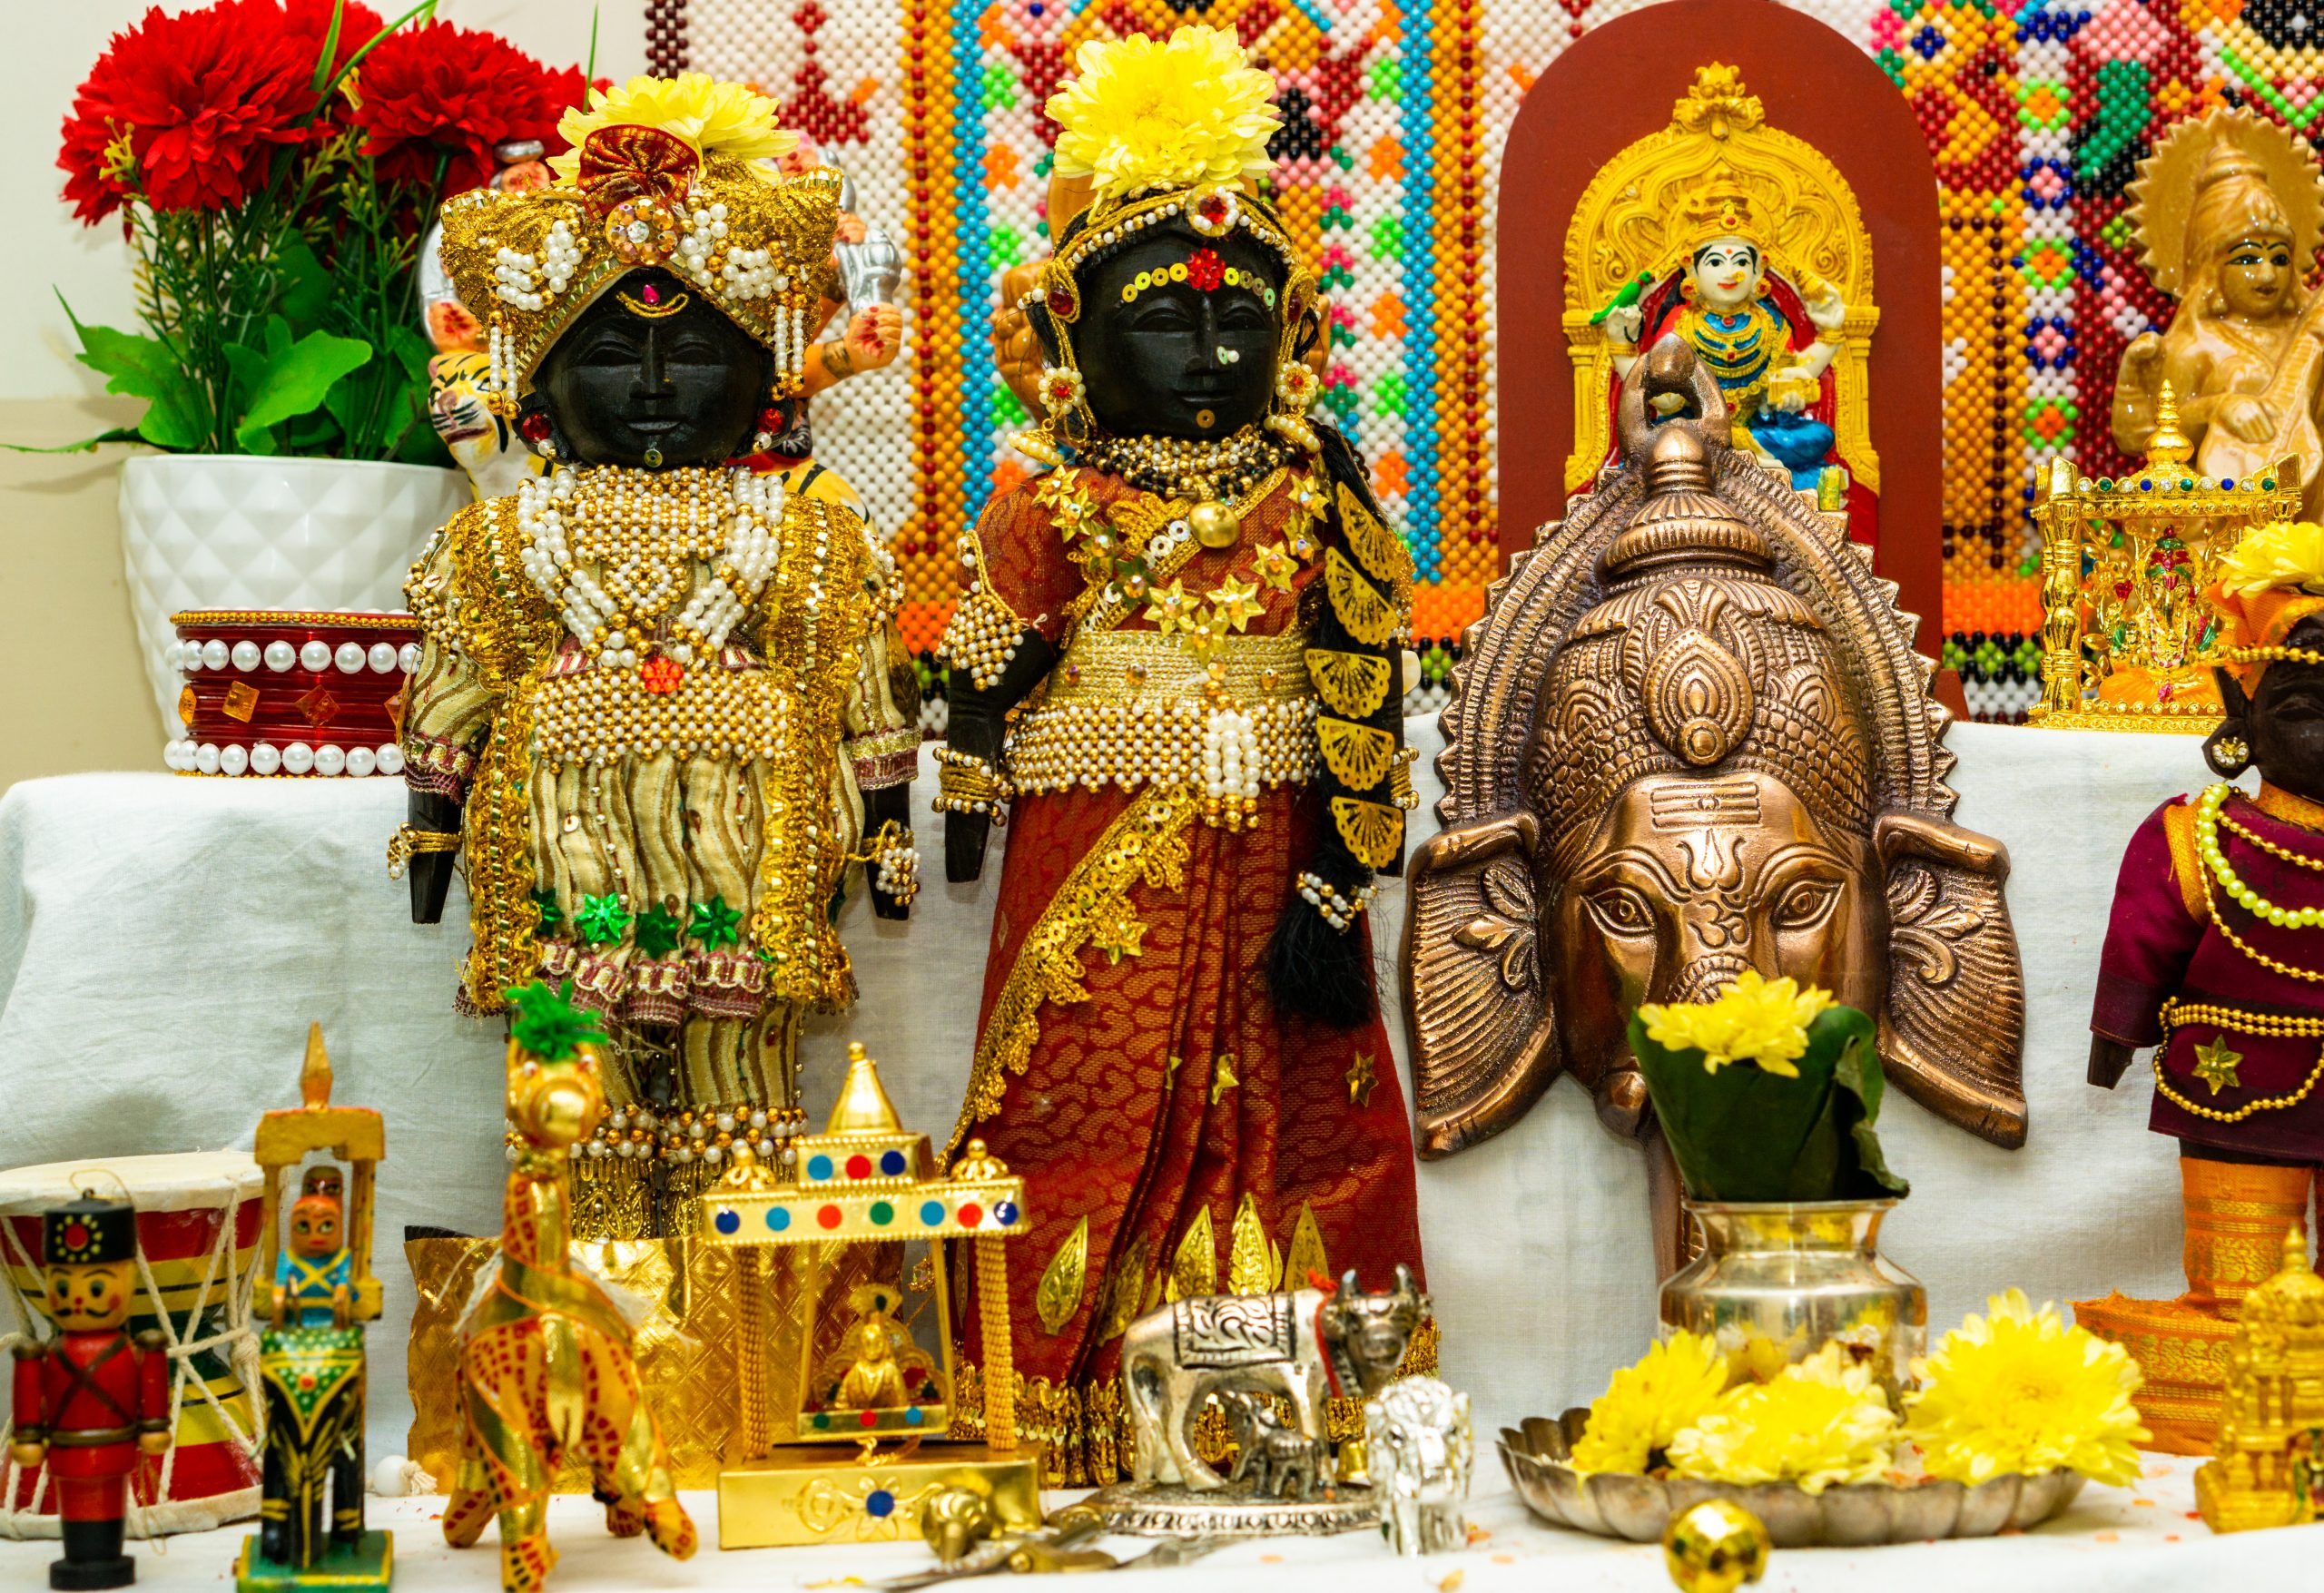 Idols arrangements in a temple